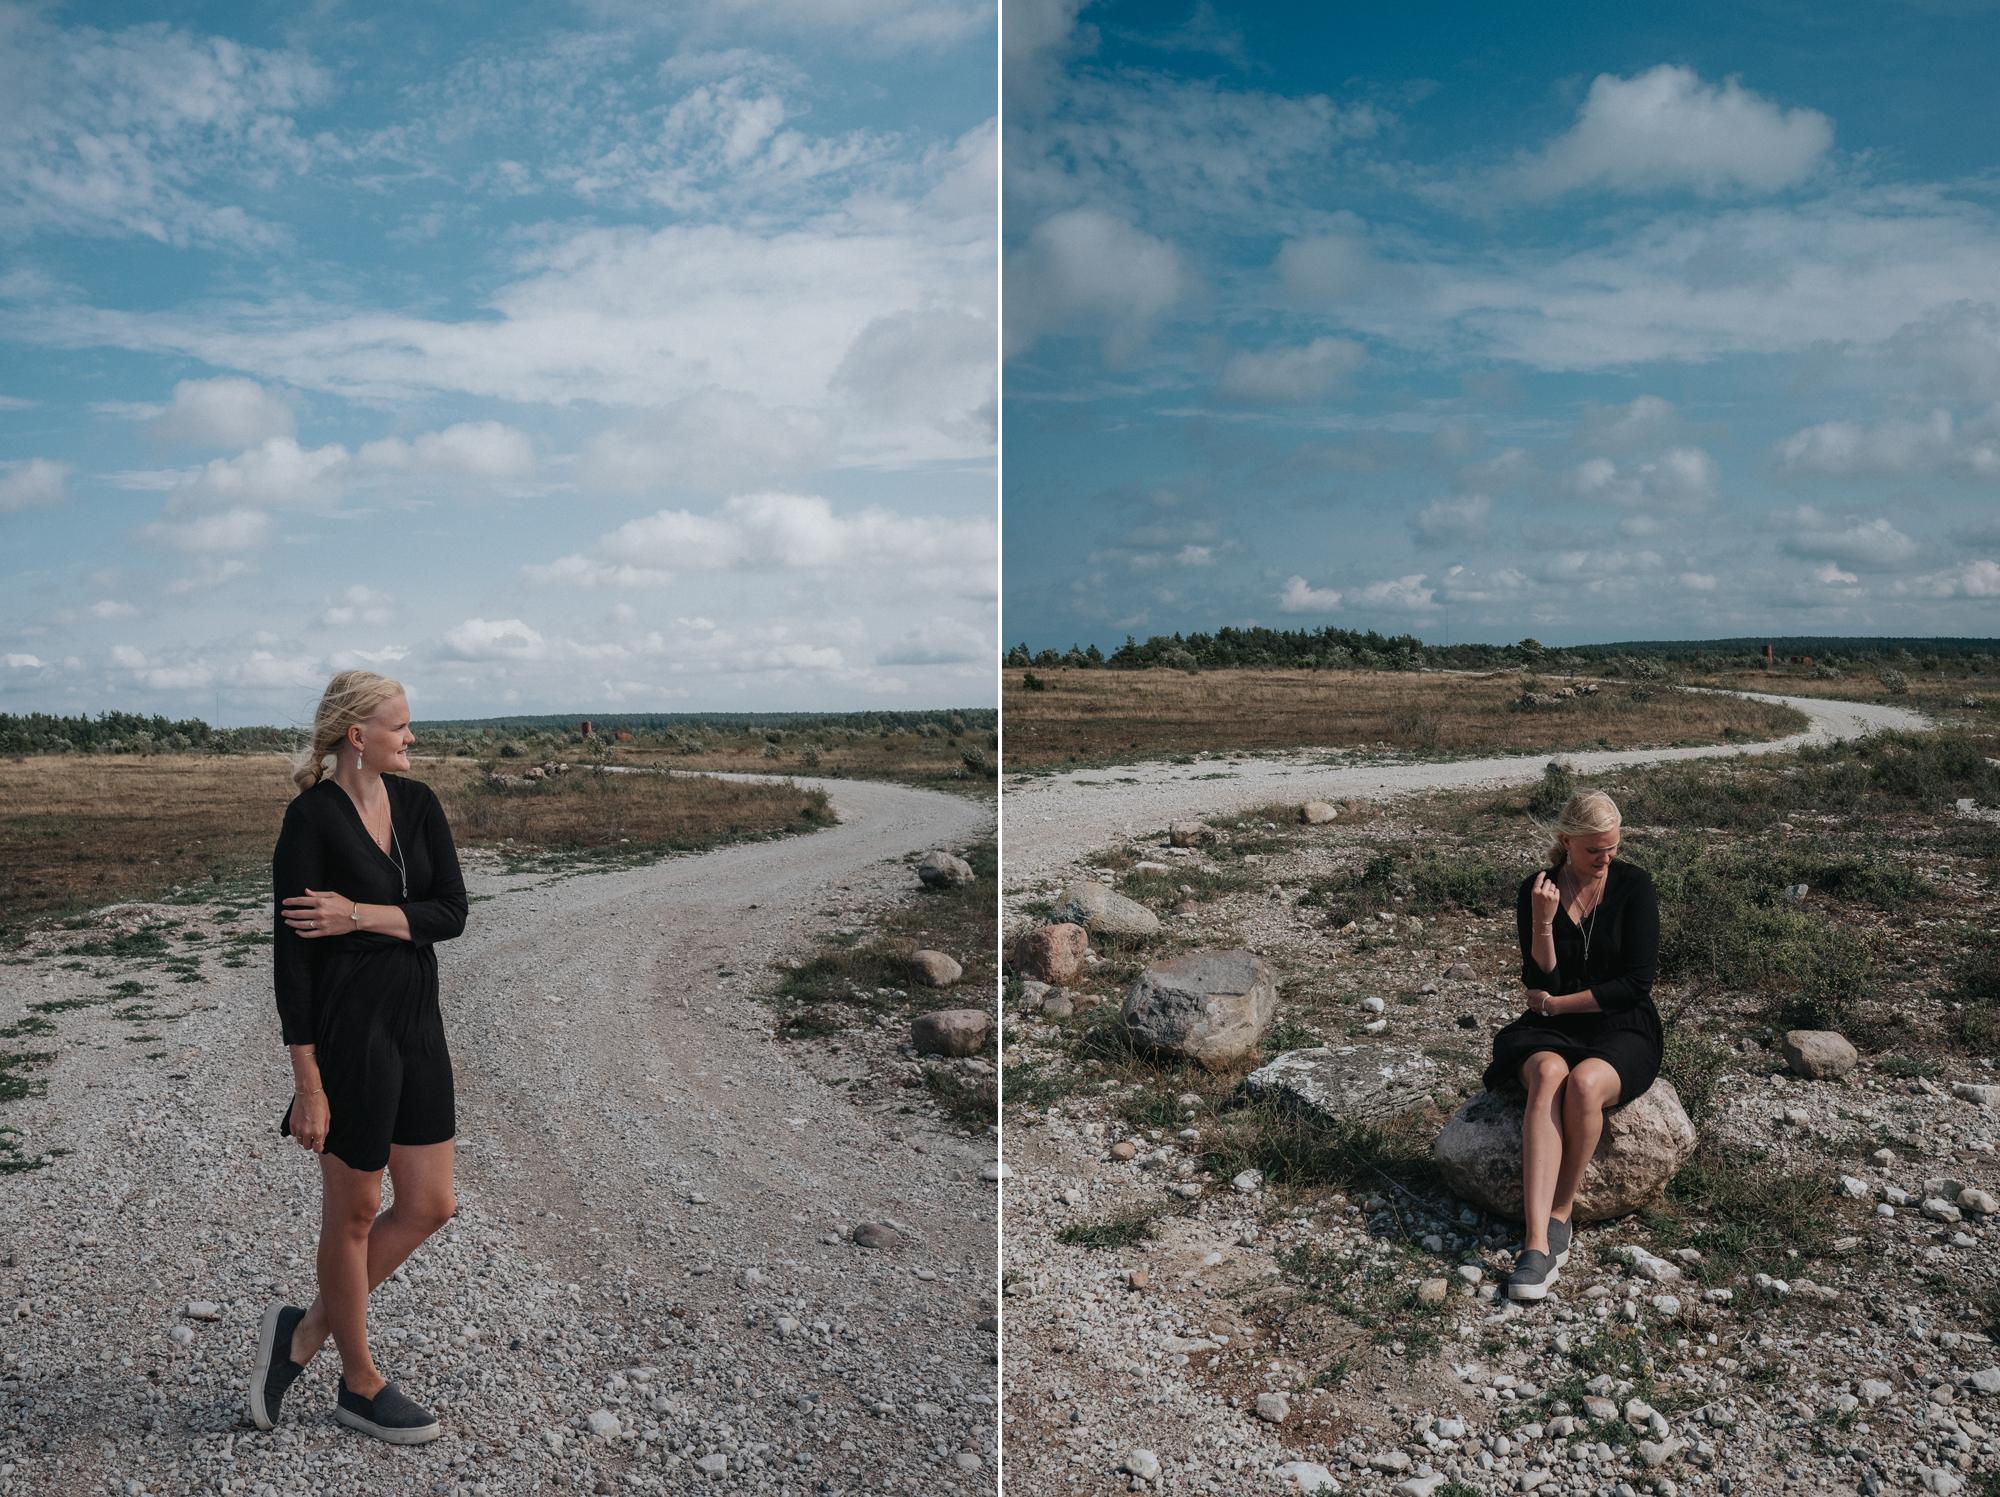 006-företagsfoto-gotland-malin-ivarsson-jewelry-neas-fotografi.jpg